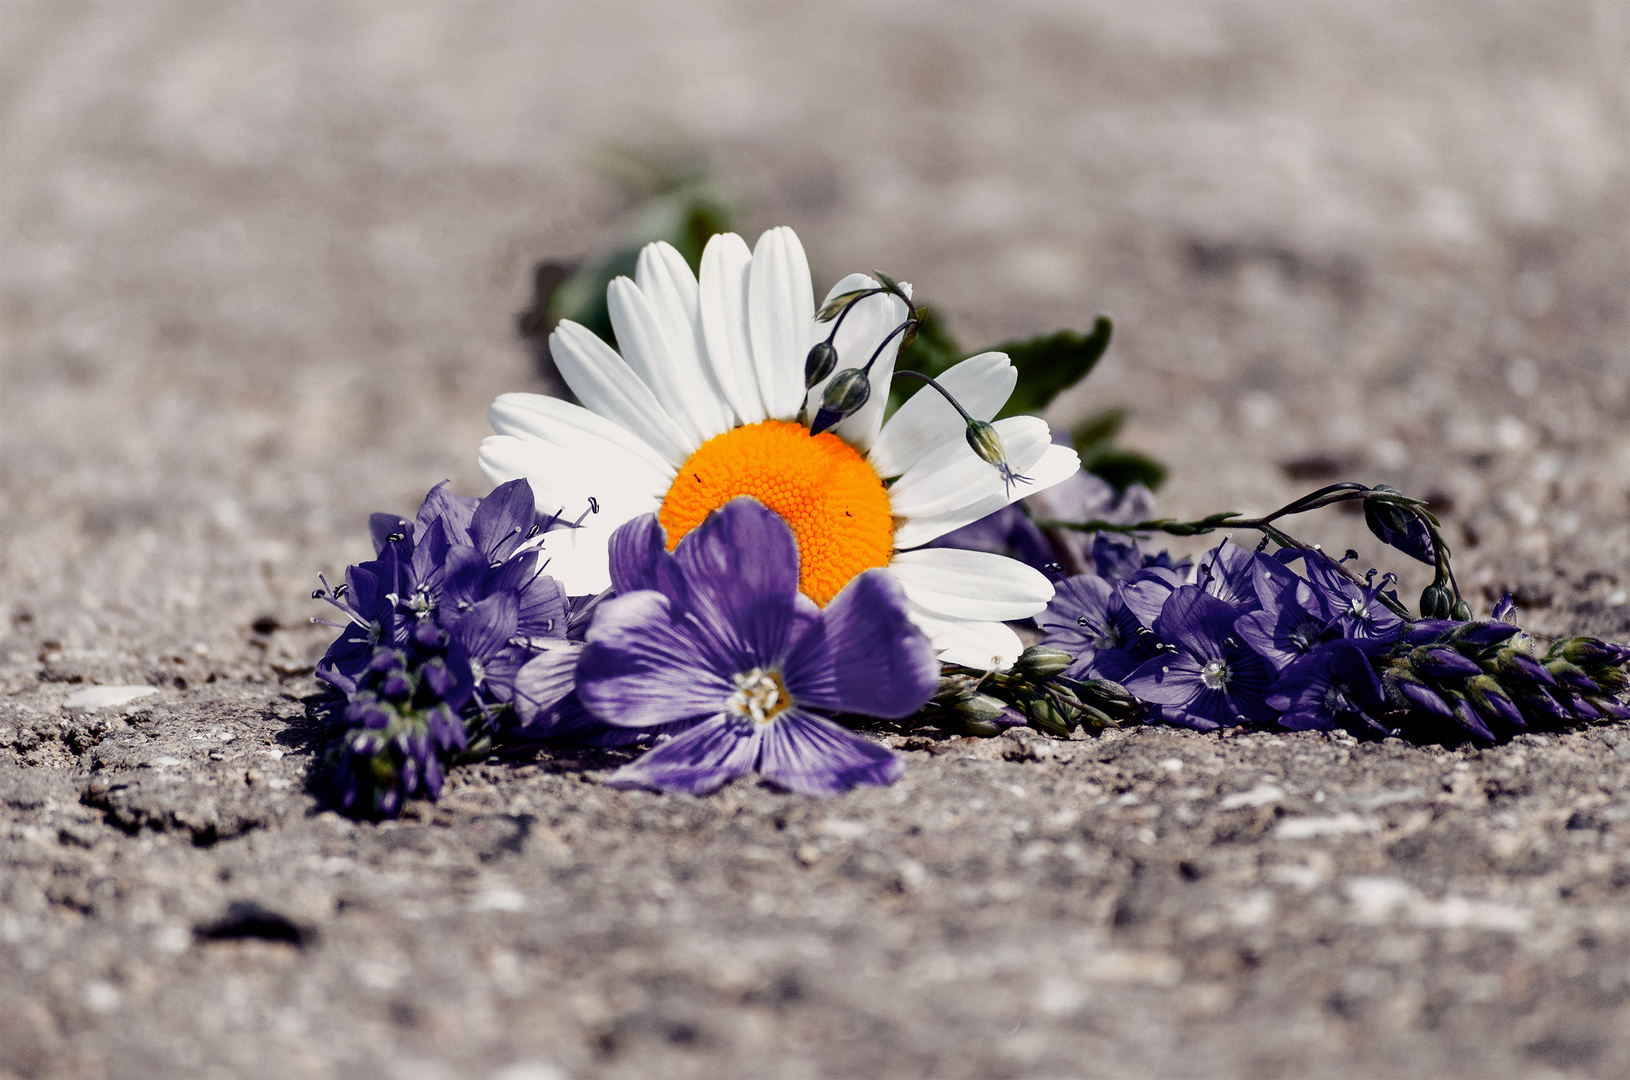 Asphaltflower